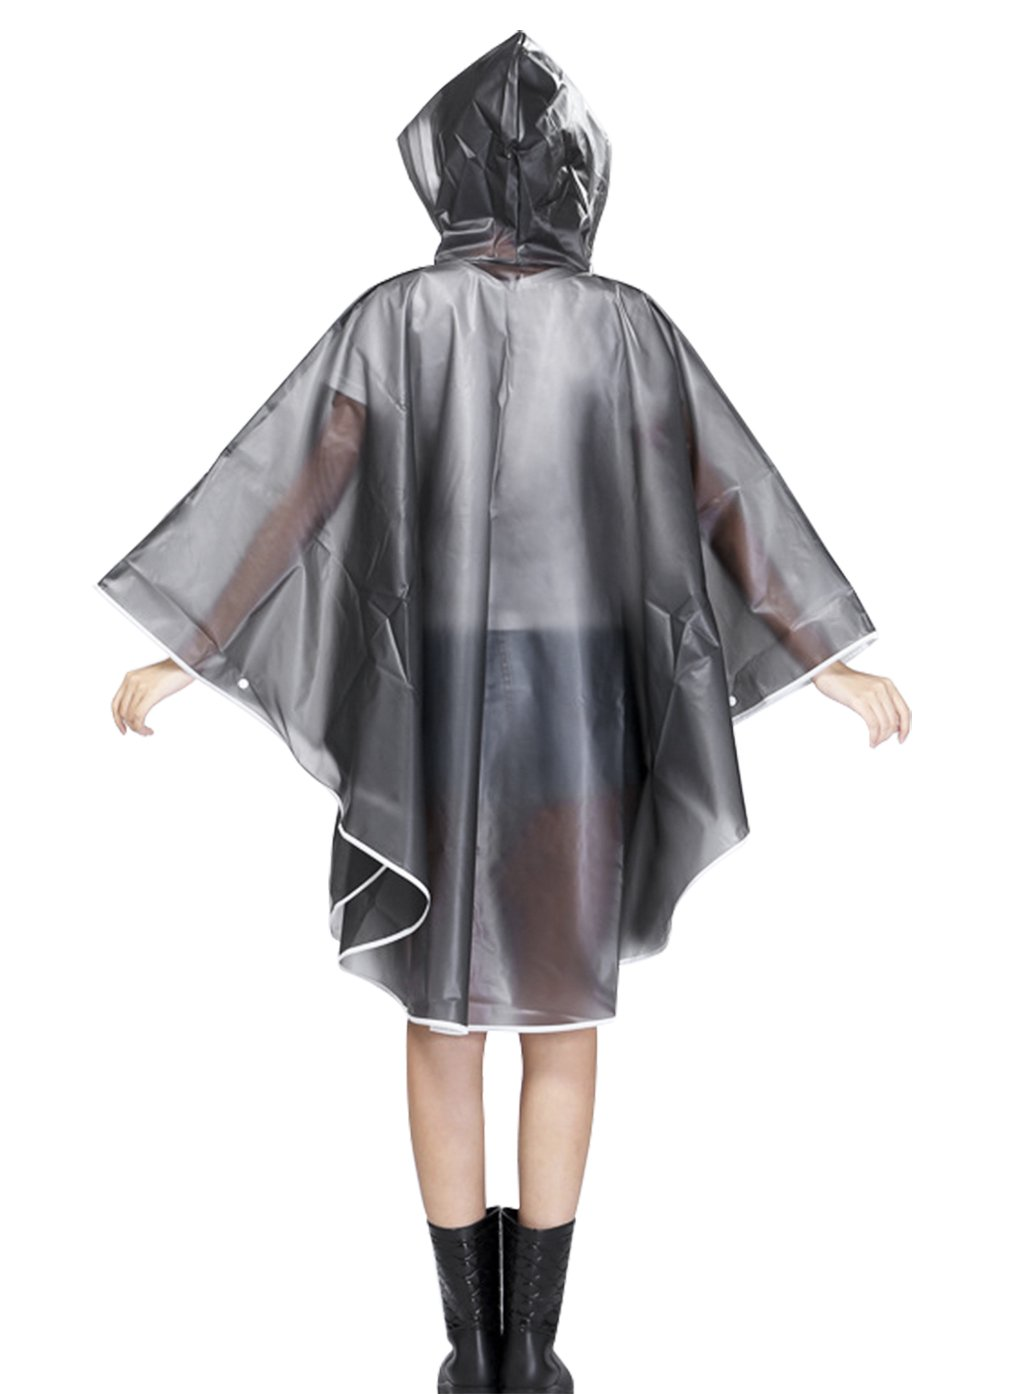 BAO CORE Abrigo de Lluvia Mujer Lluvia Poncho EVA Impermeable Lluvia Chaqueta Impermeable Poncho Lluvia Capa con Capucha y Mangas Outdoor Sport contra Lluvia Blanco y Negro